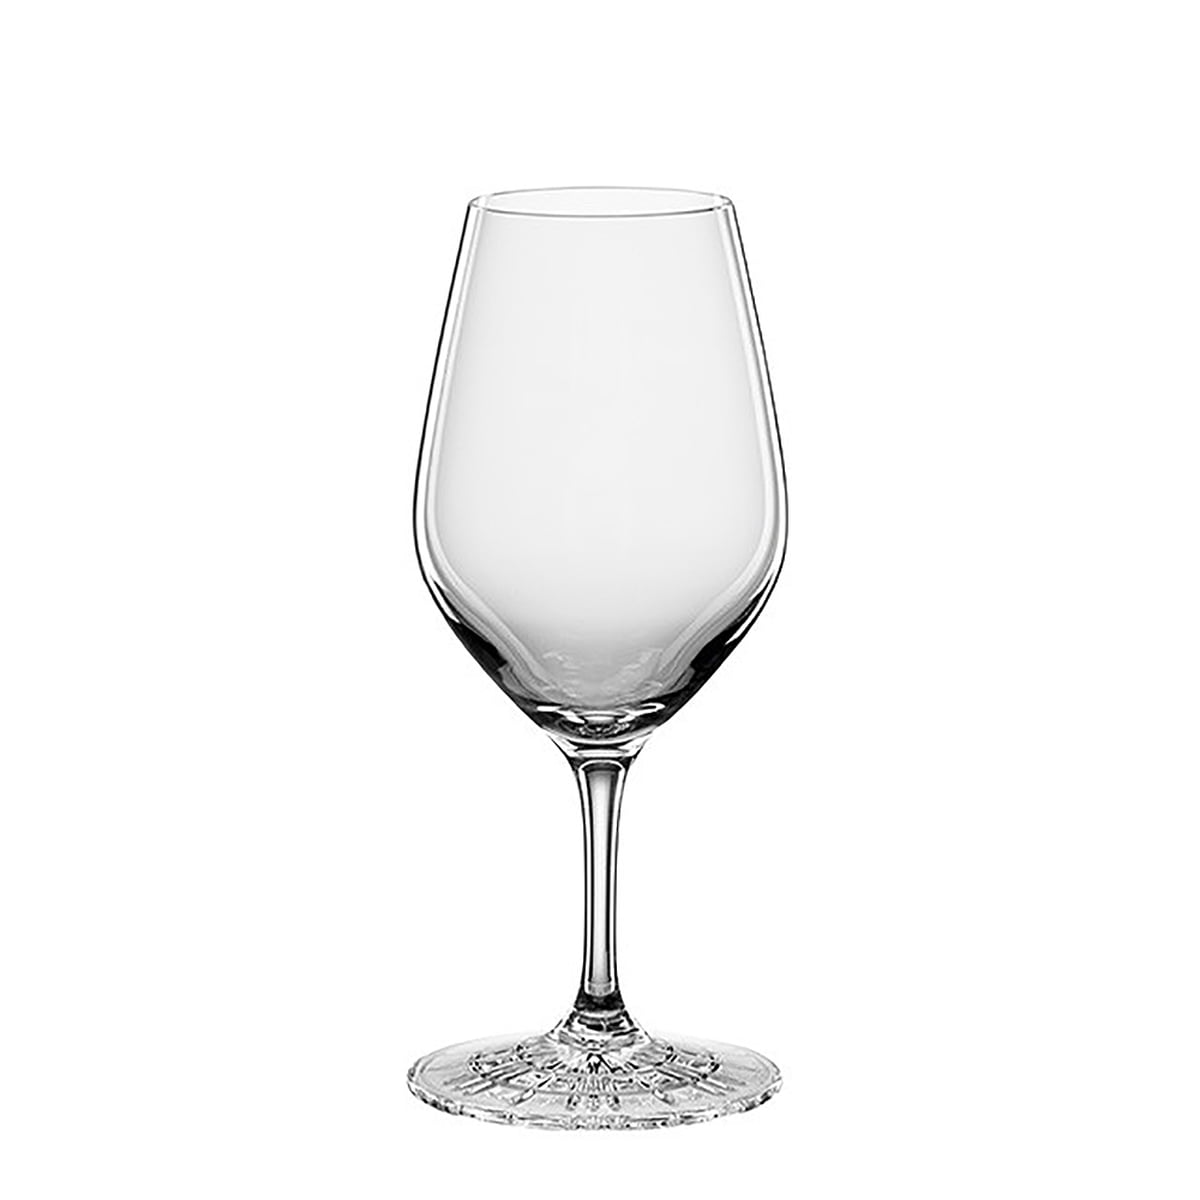 Spiegelau Perfect Serve Tasting Glass